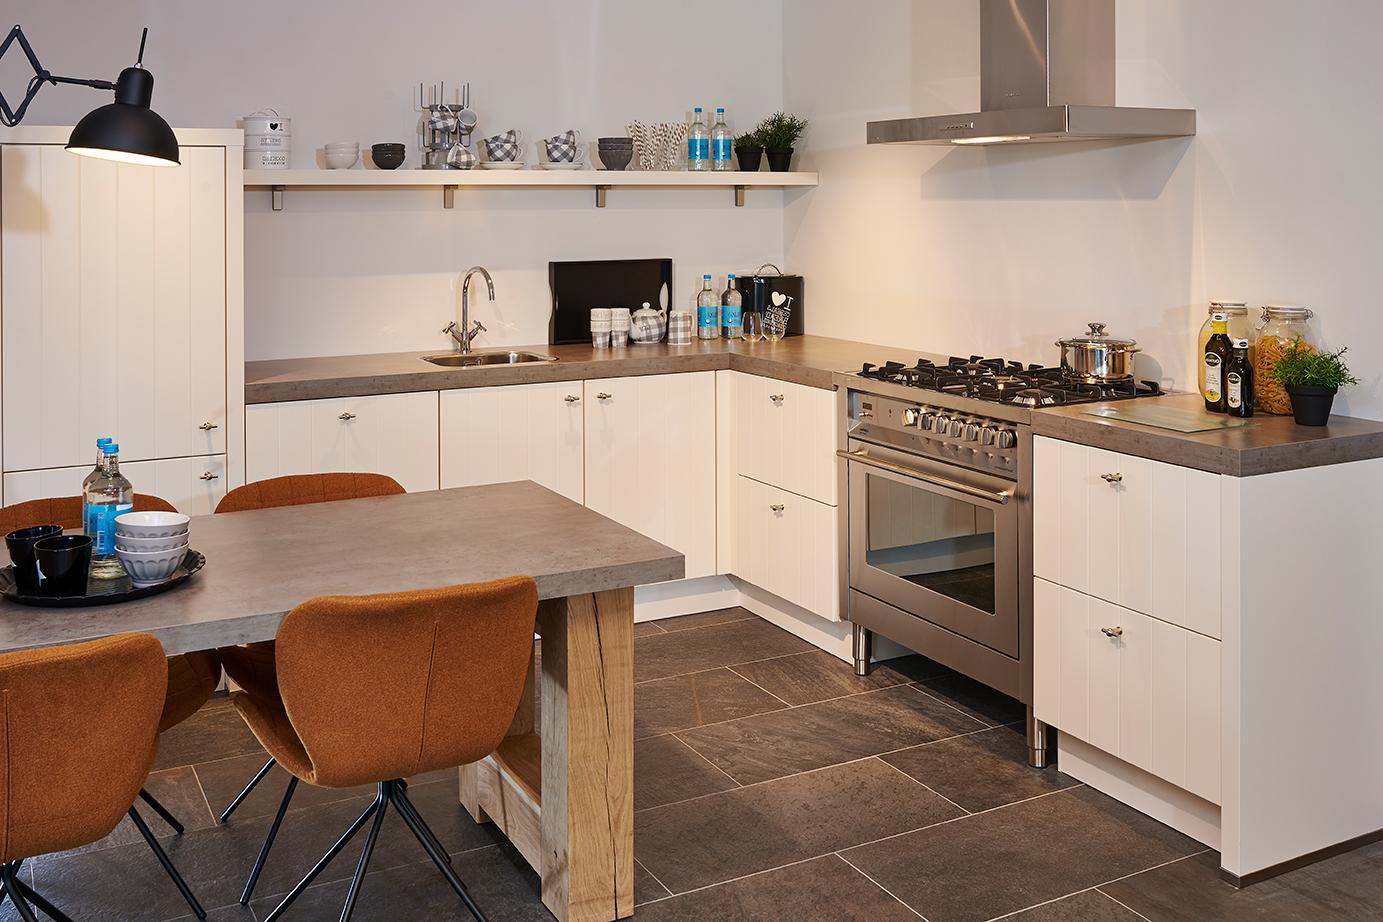 Landelijke Keukens Betaalbaar : Keukenmerken DBasic line tot SieMatic Lage prijs! DB